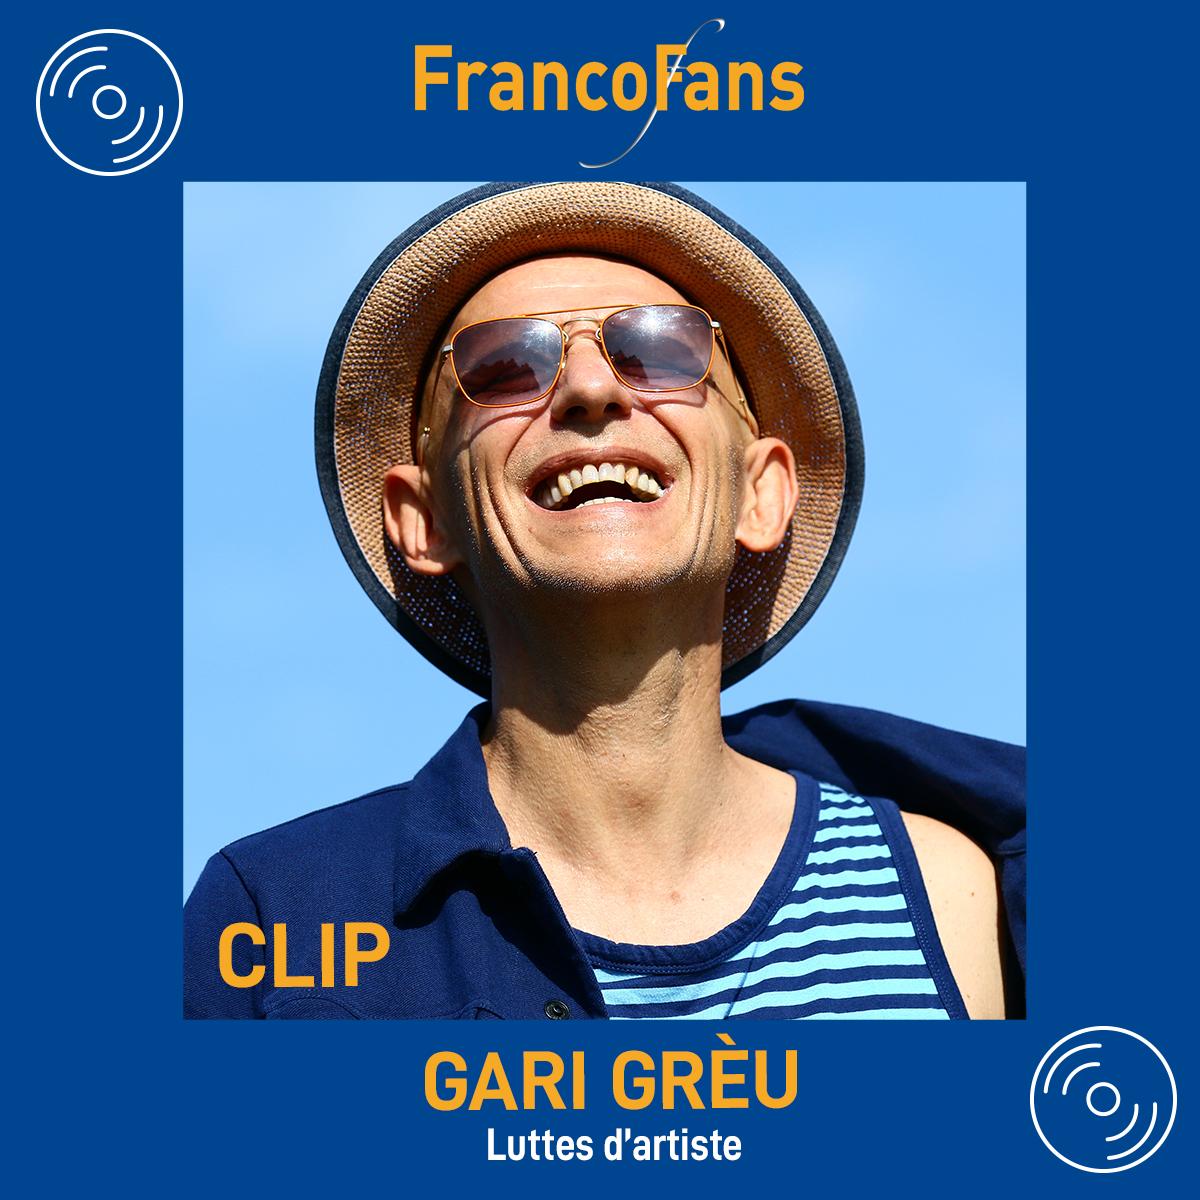 [Clip] Gari Grèu - Luttes d'artiste